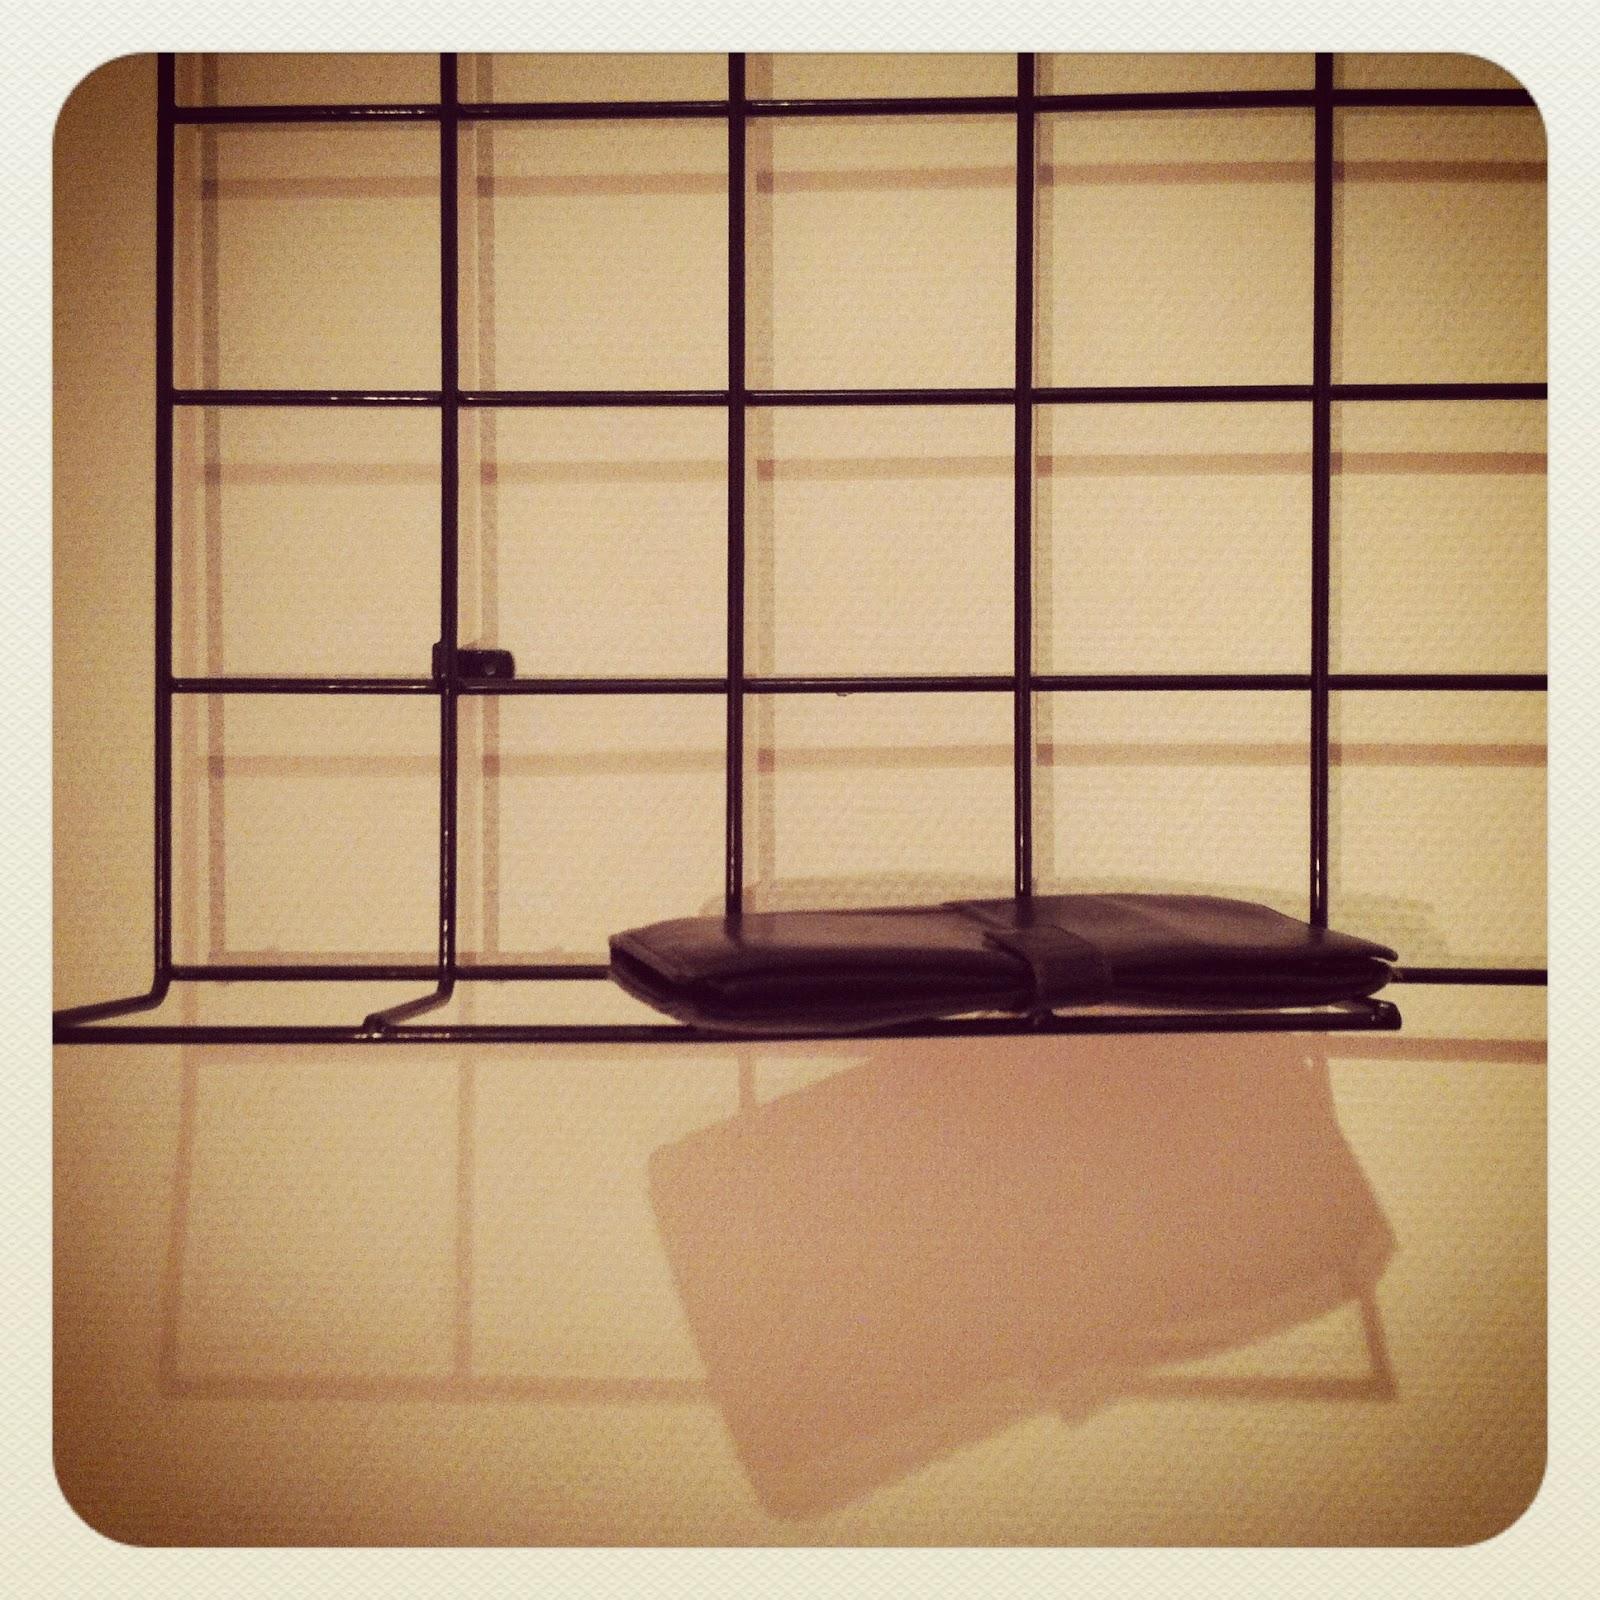 70er jahre gitter metall wandgarderobe verkauft le site. Black Bedroom Furniture Sets. Home Design Ideas